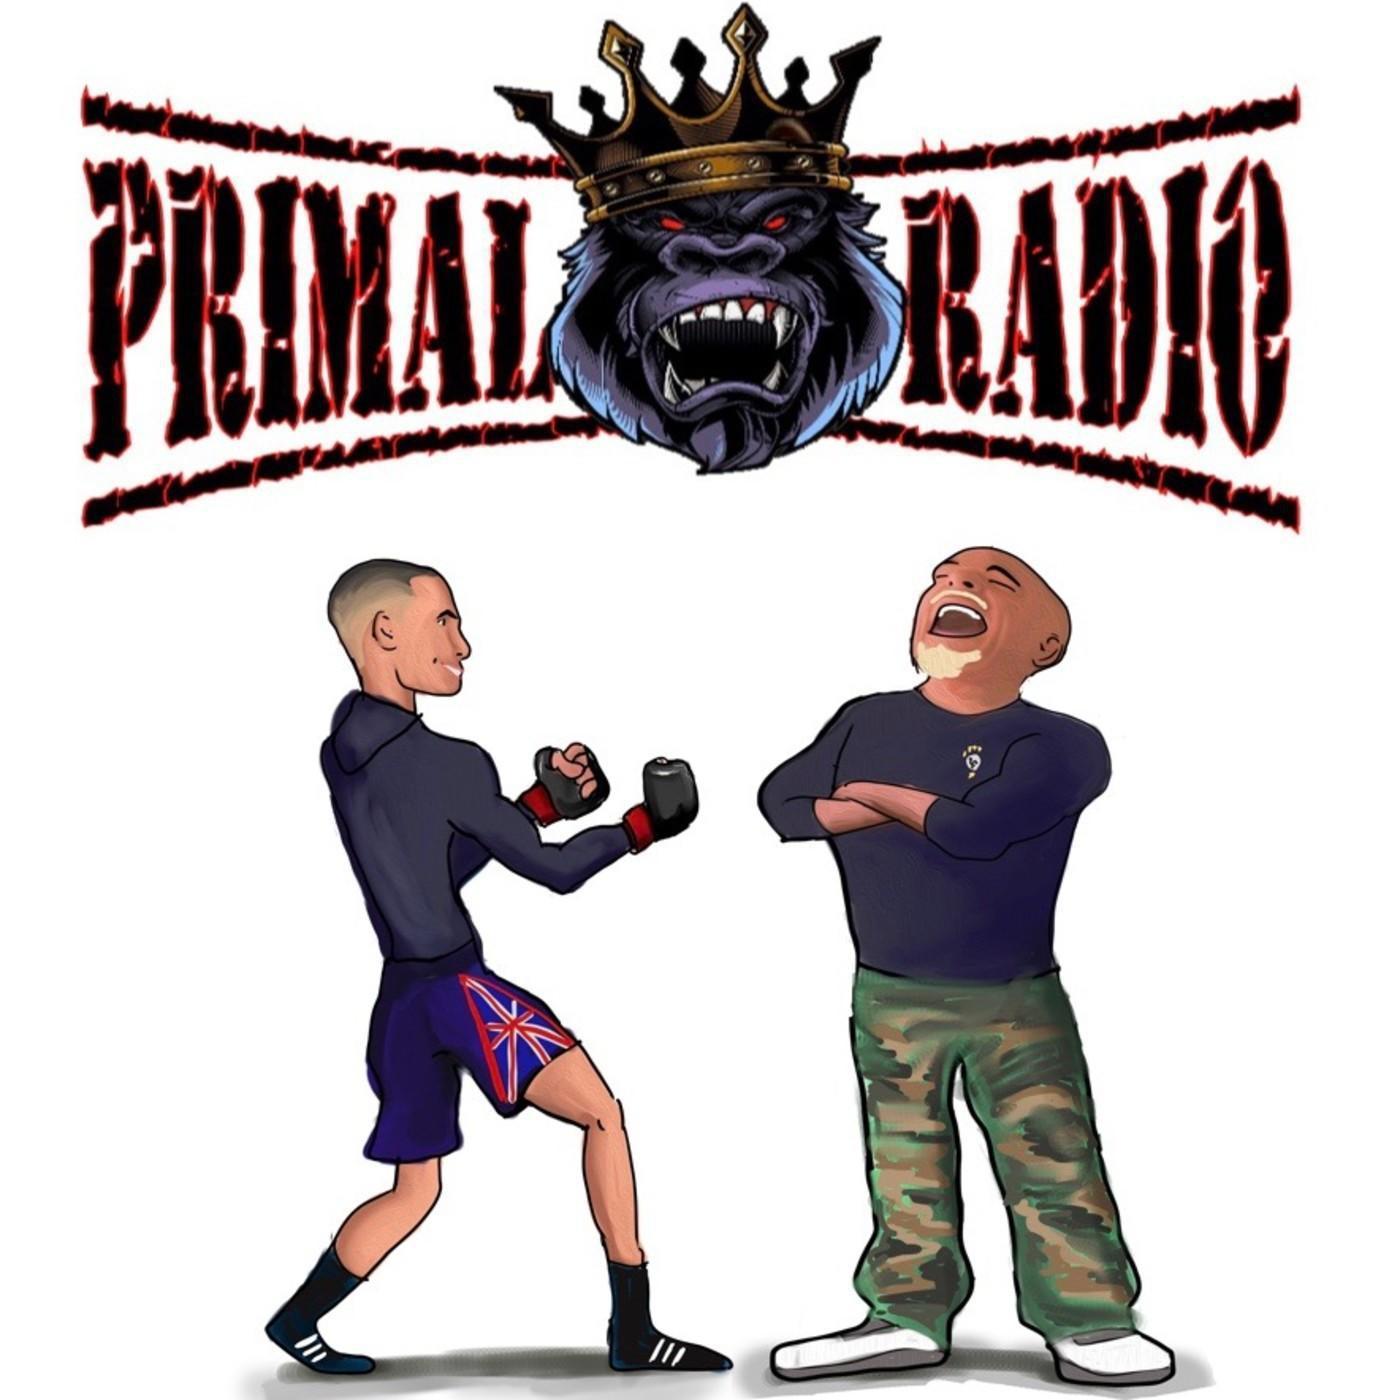 Primal riebalų deginimo podcast